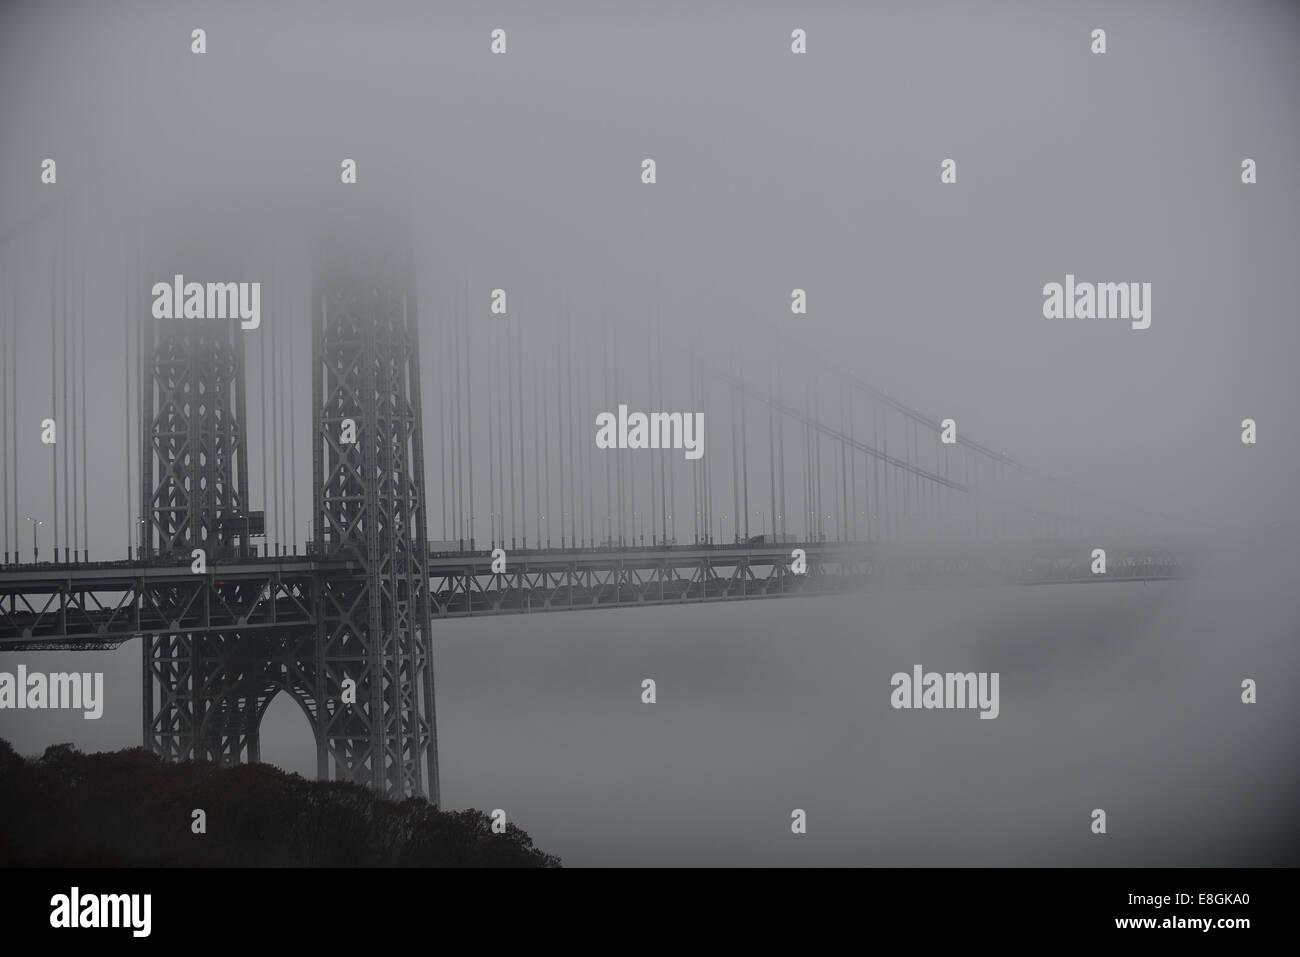 USA, New York State, New York City, Bridge into mist - Stock Image